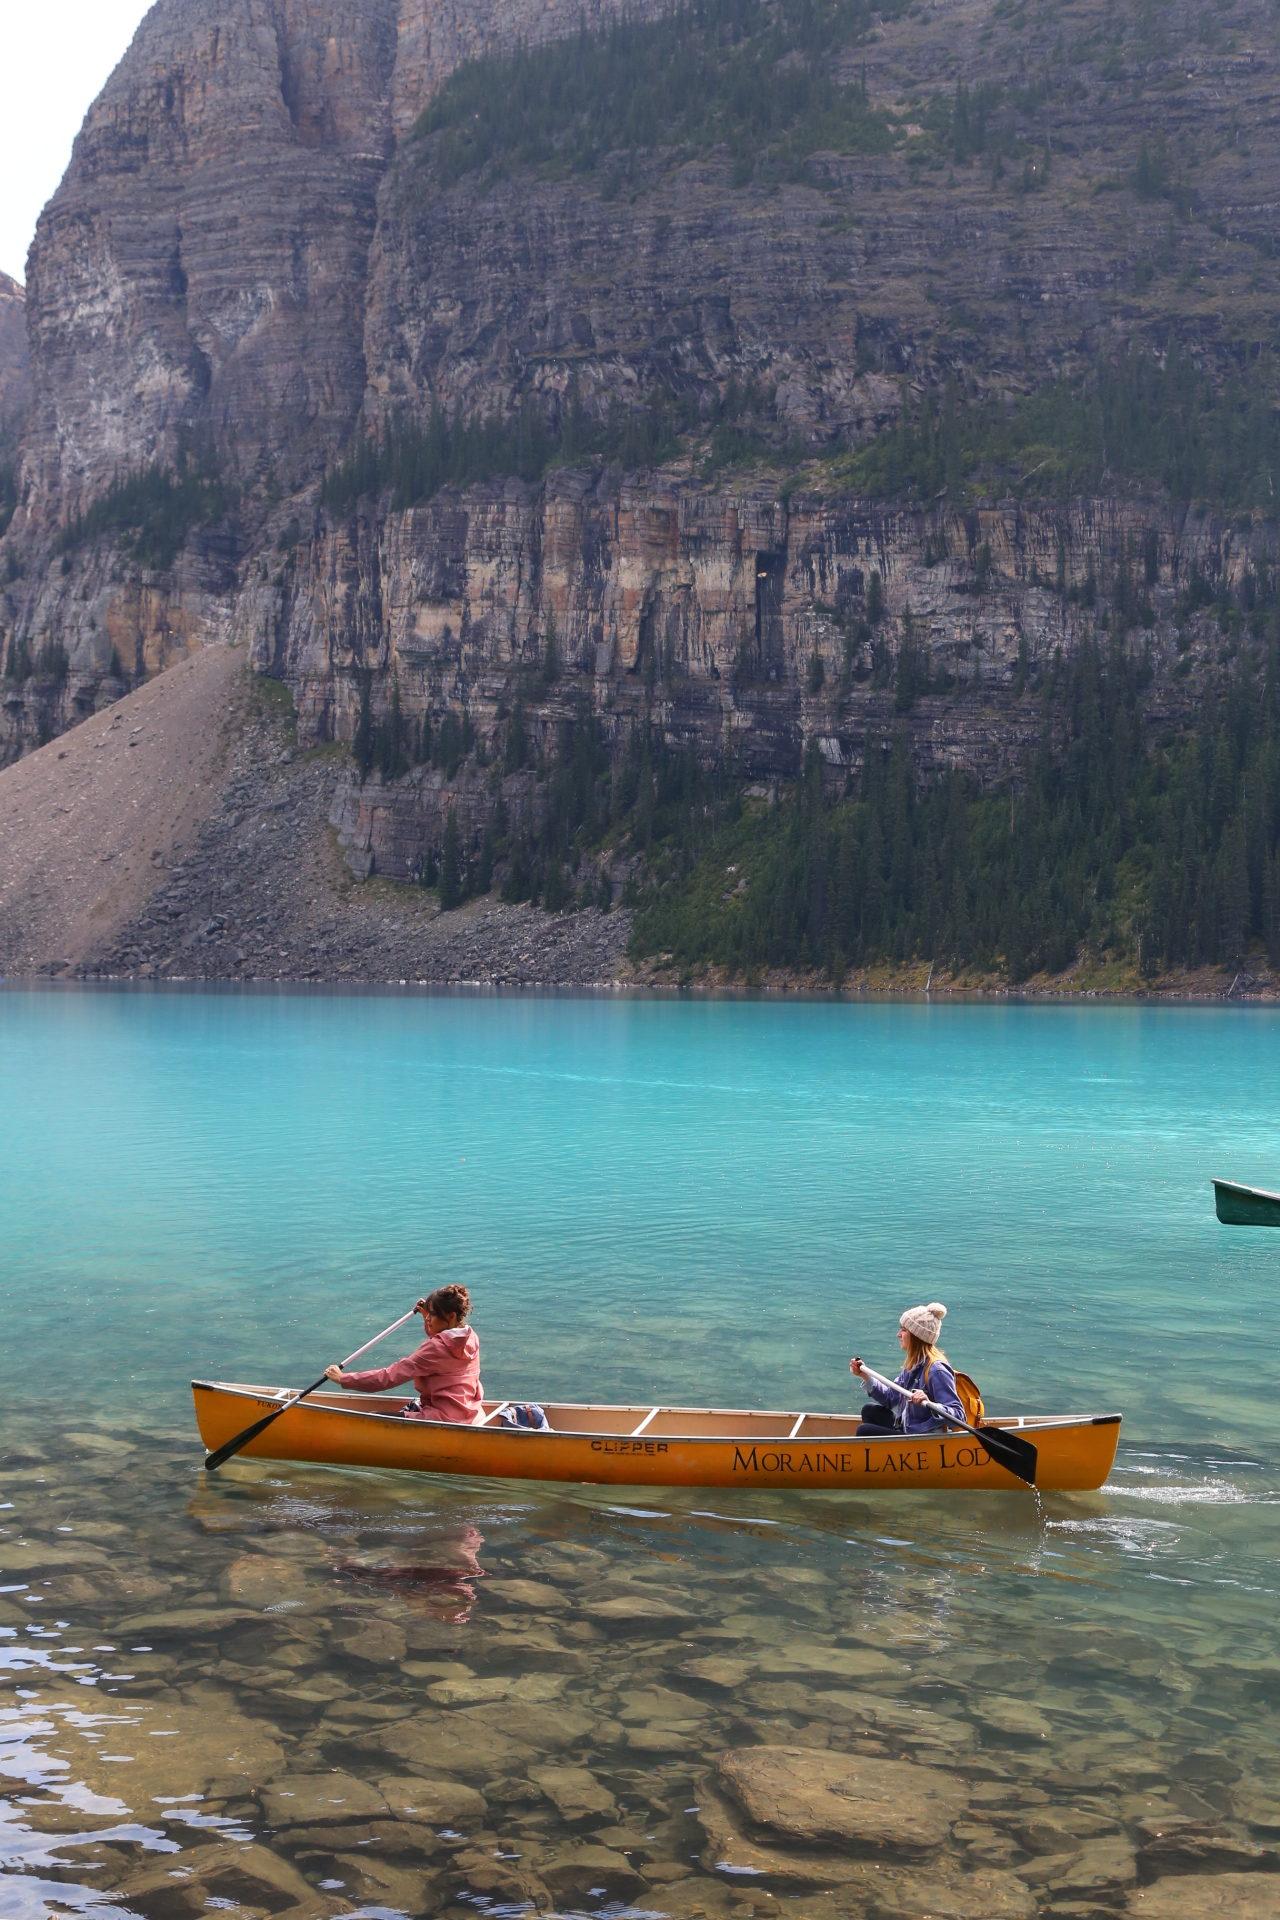 Erie Nick Lake Louise City Guide: Lake Moraine Canoeing